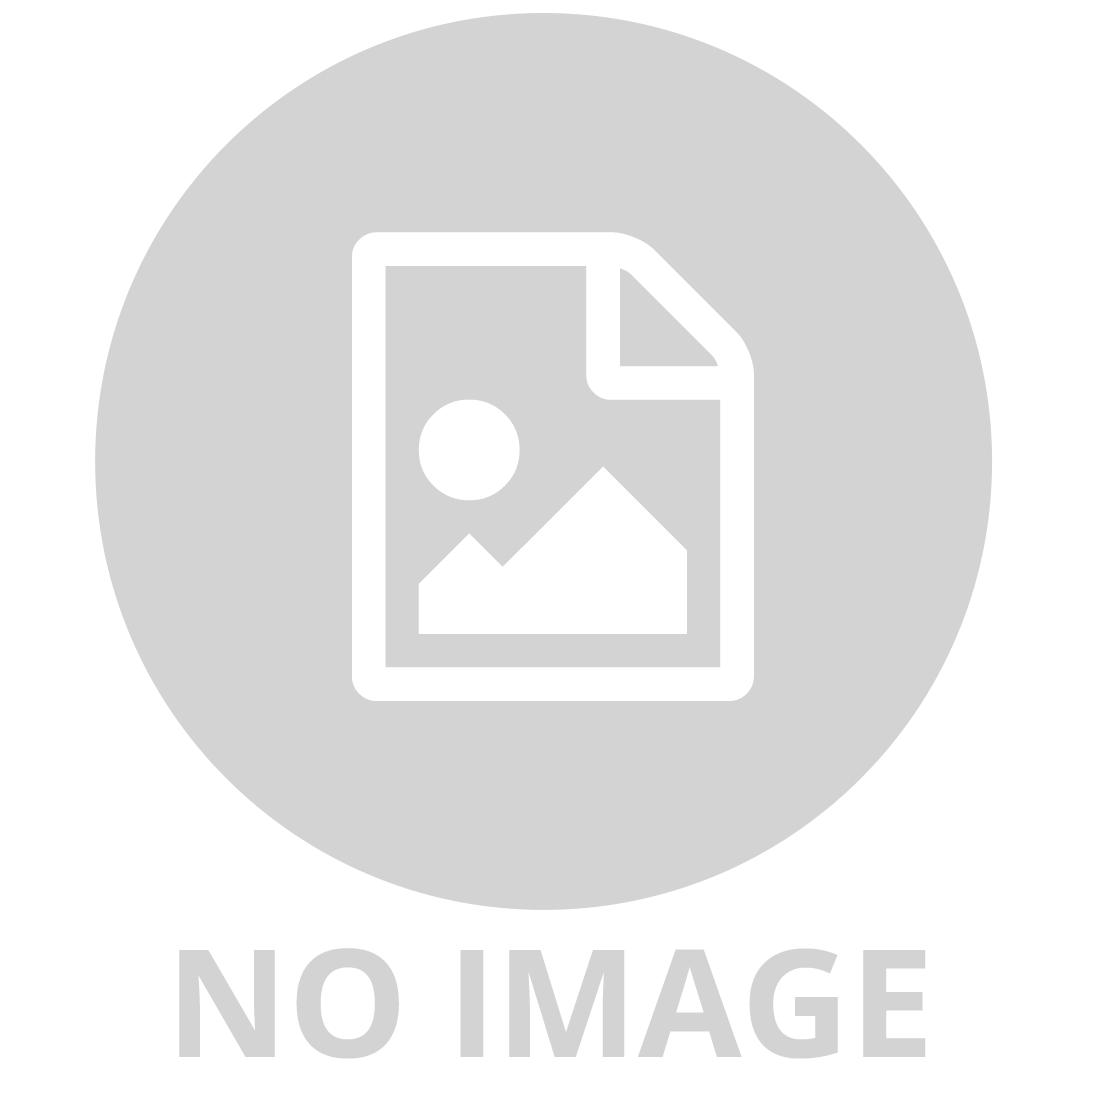 RAVENSBURGER 500PC PUZZLE LOAUTERBRUNNEN SWITZERLAND